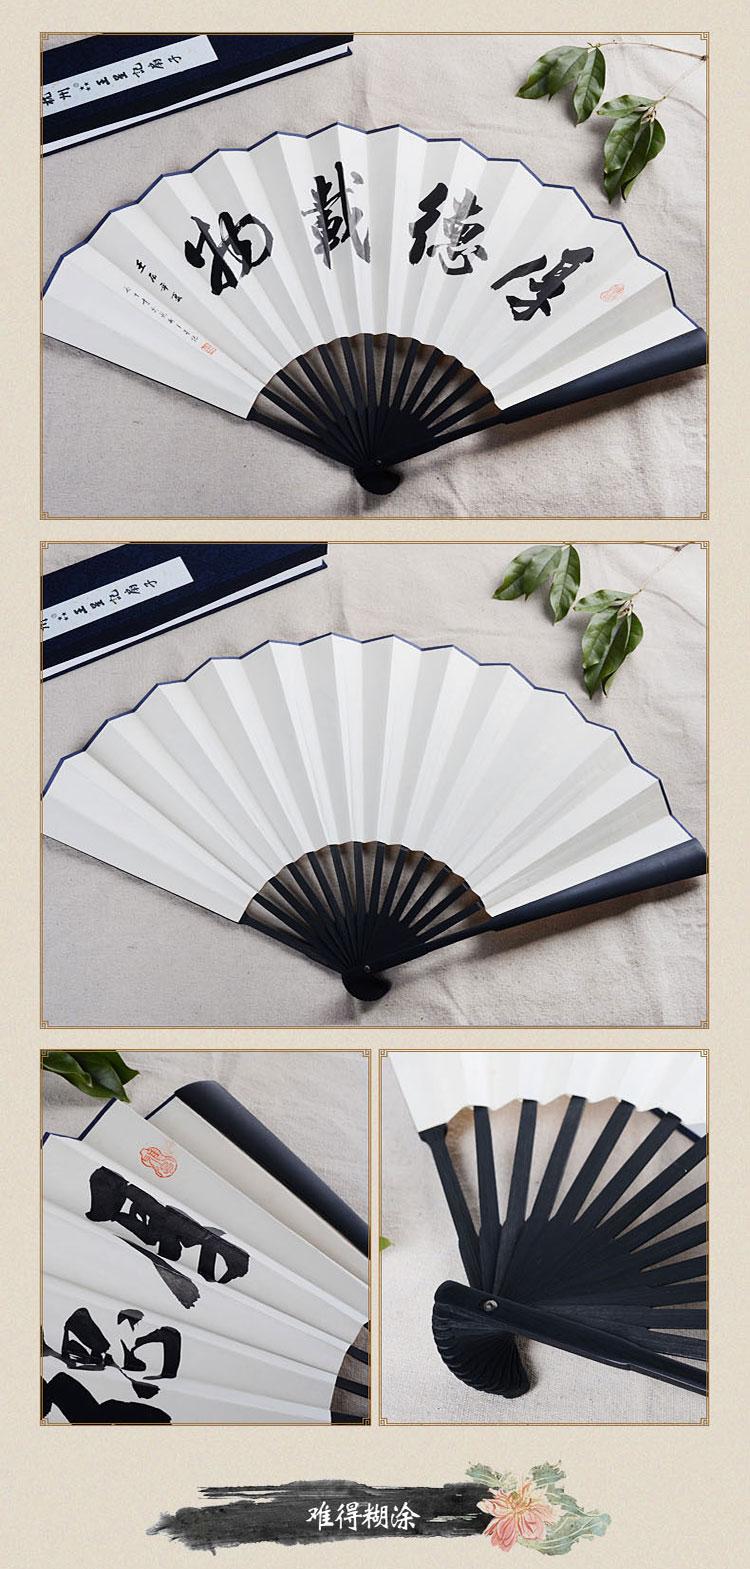 wang xing ji/王星记 33cm仿乌木书法大字白纸扇 男士折扇 扇子高档